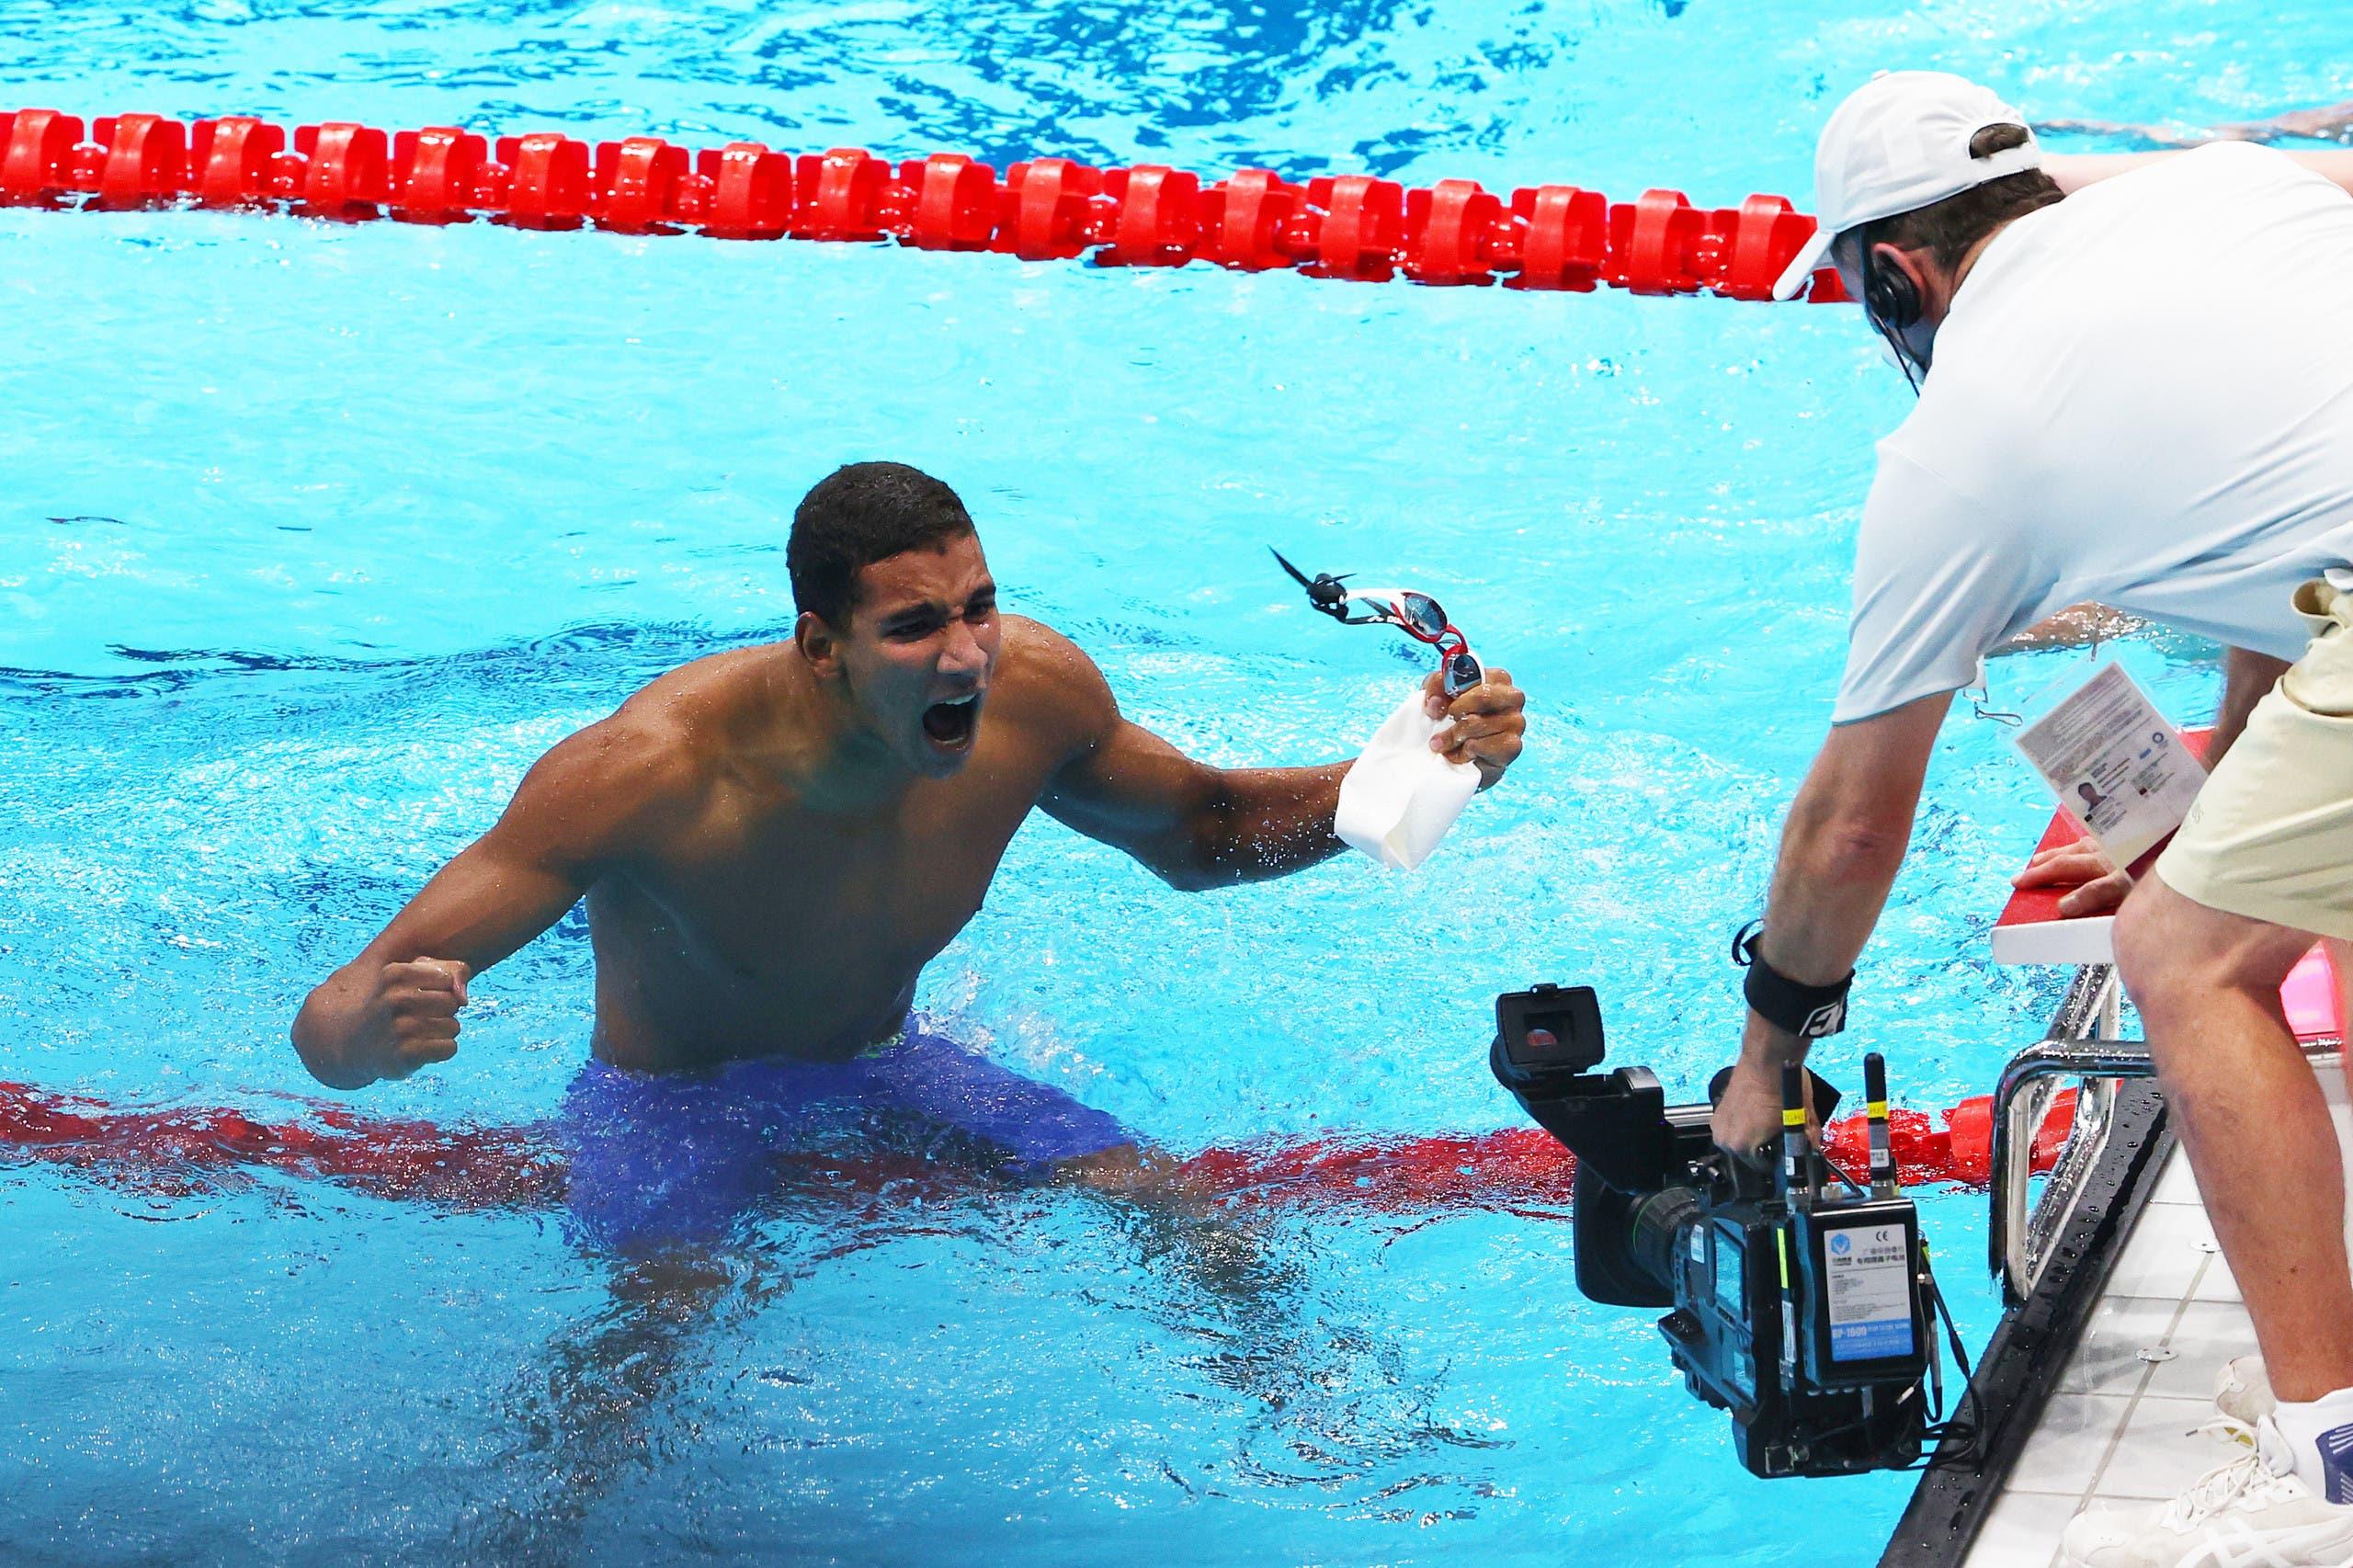 Ahmed Hafnaoui of Tunisia celebrates after winning. (Reuters)